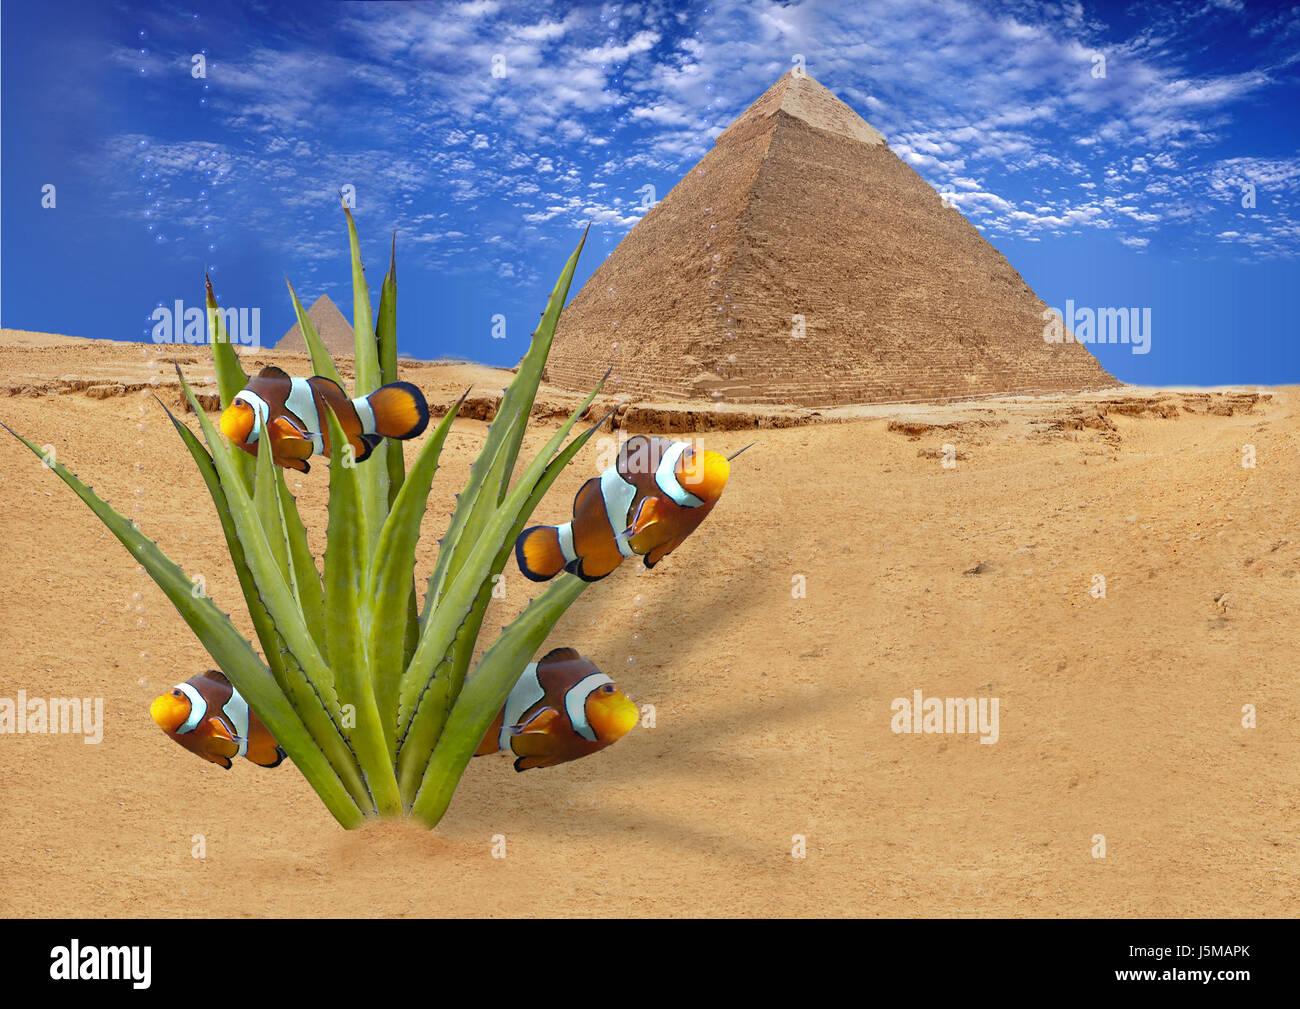 blue life exist existence living lives desert wasteland fantasy heat cactus Stock Photo